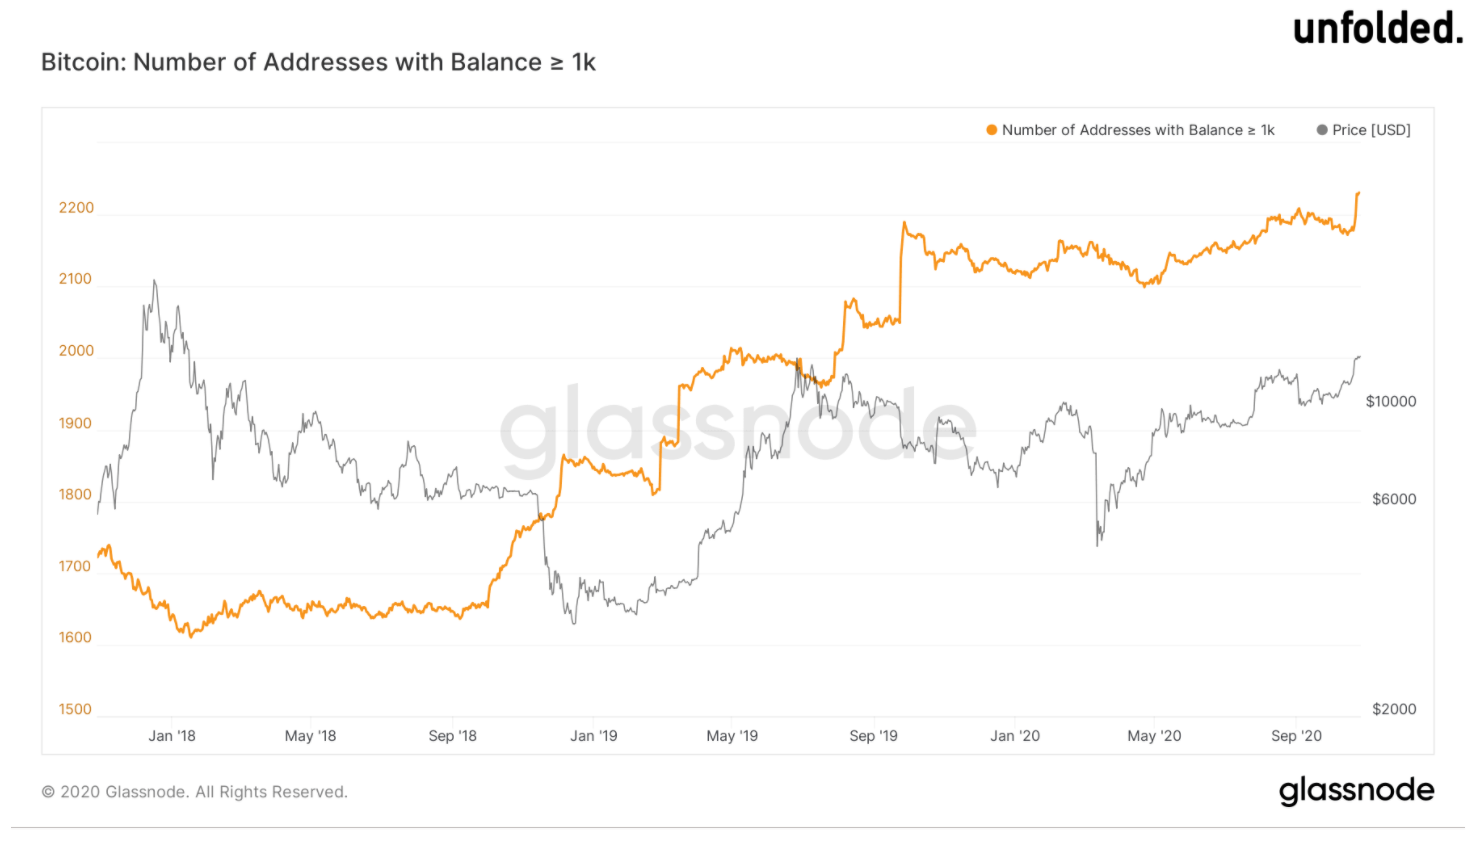 Bitcoin address balance greater than 1,000 BTC